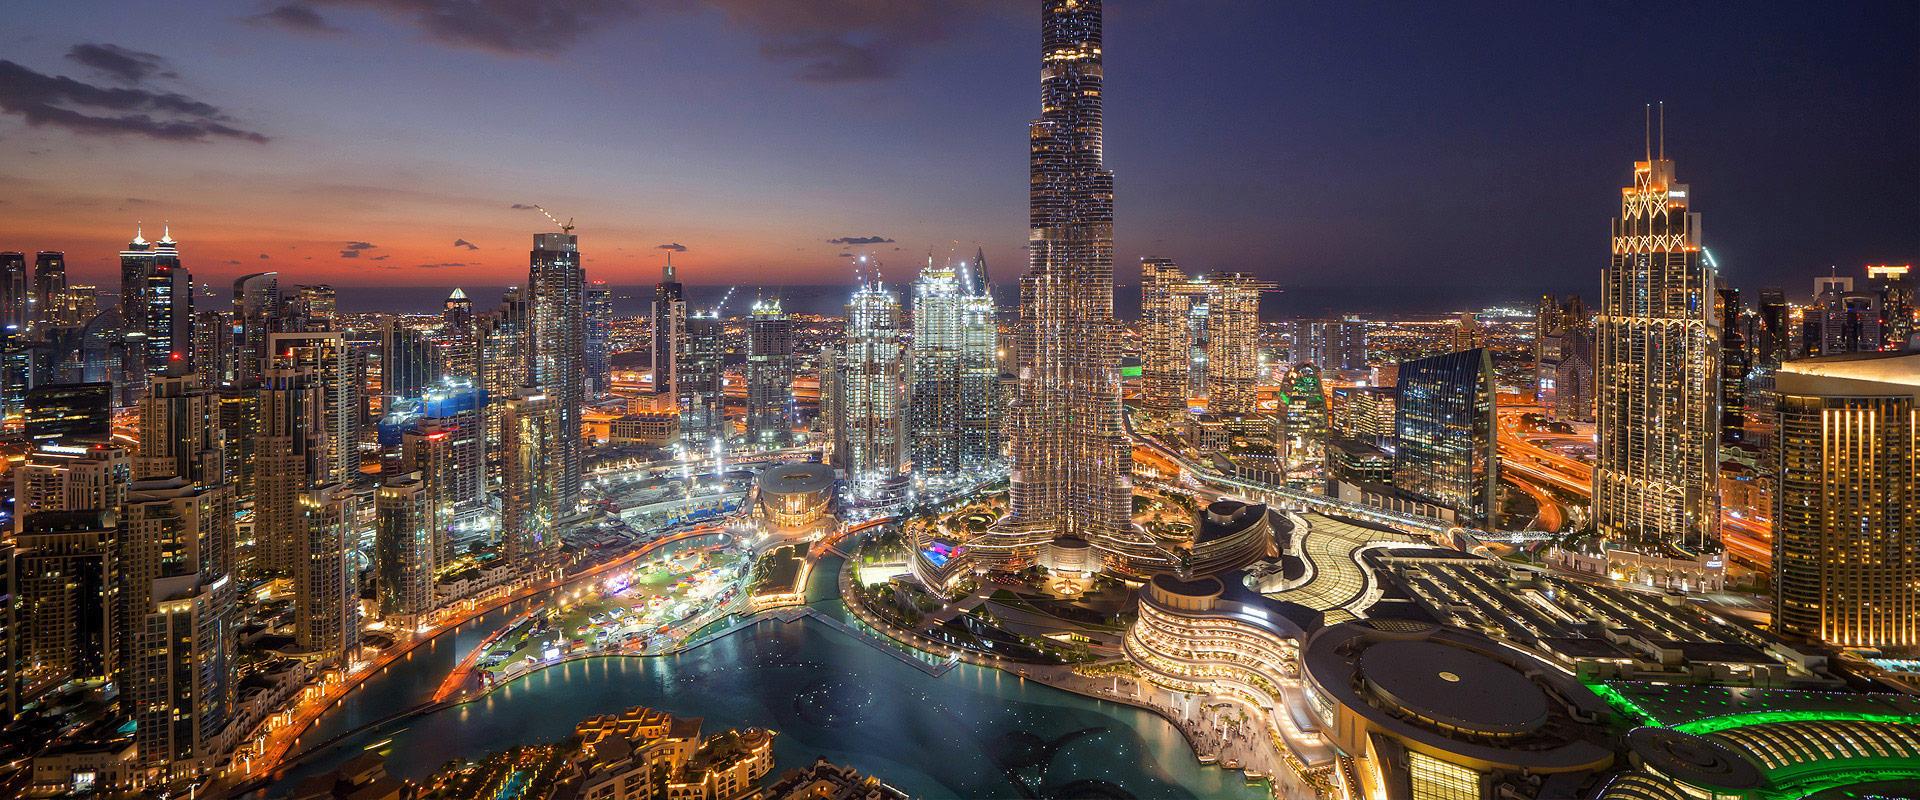 Dubai Visa Online Status Tracking